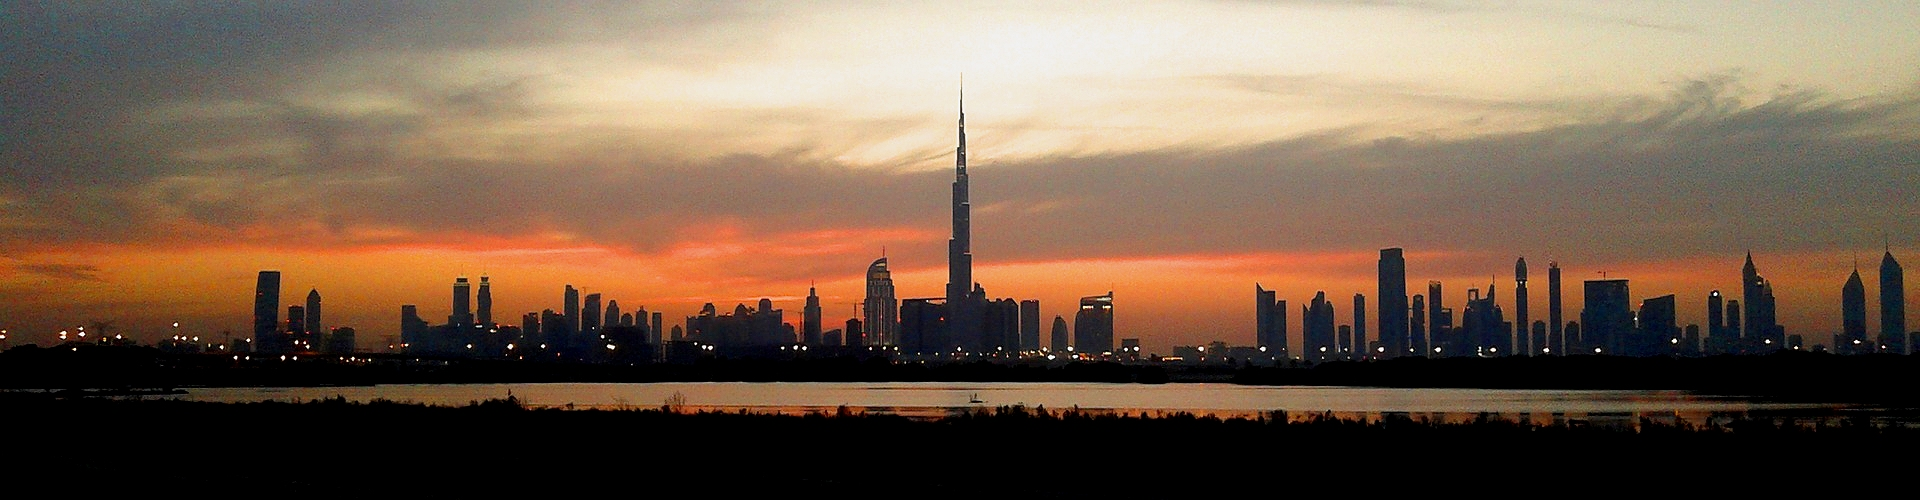 Reisetipps zum Thema: Burj Khalifa